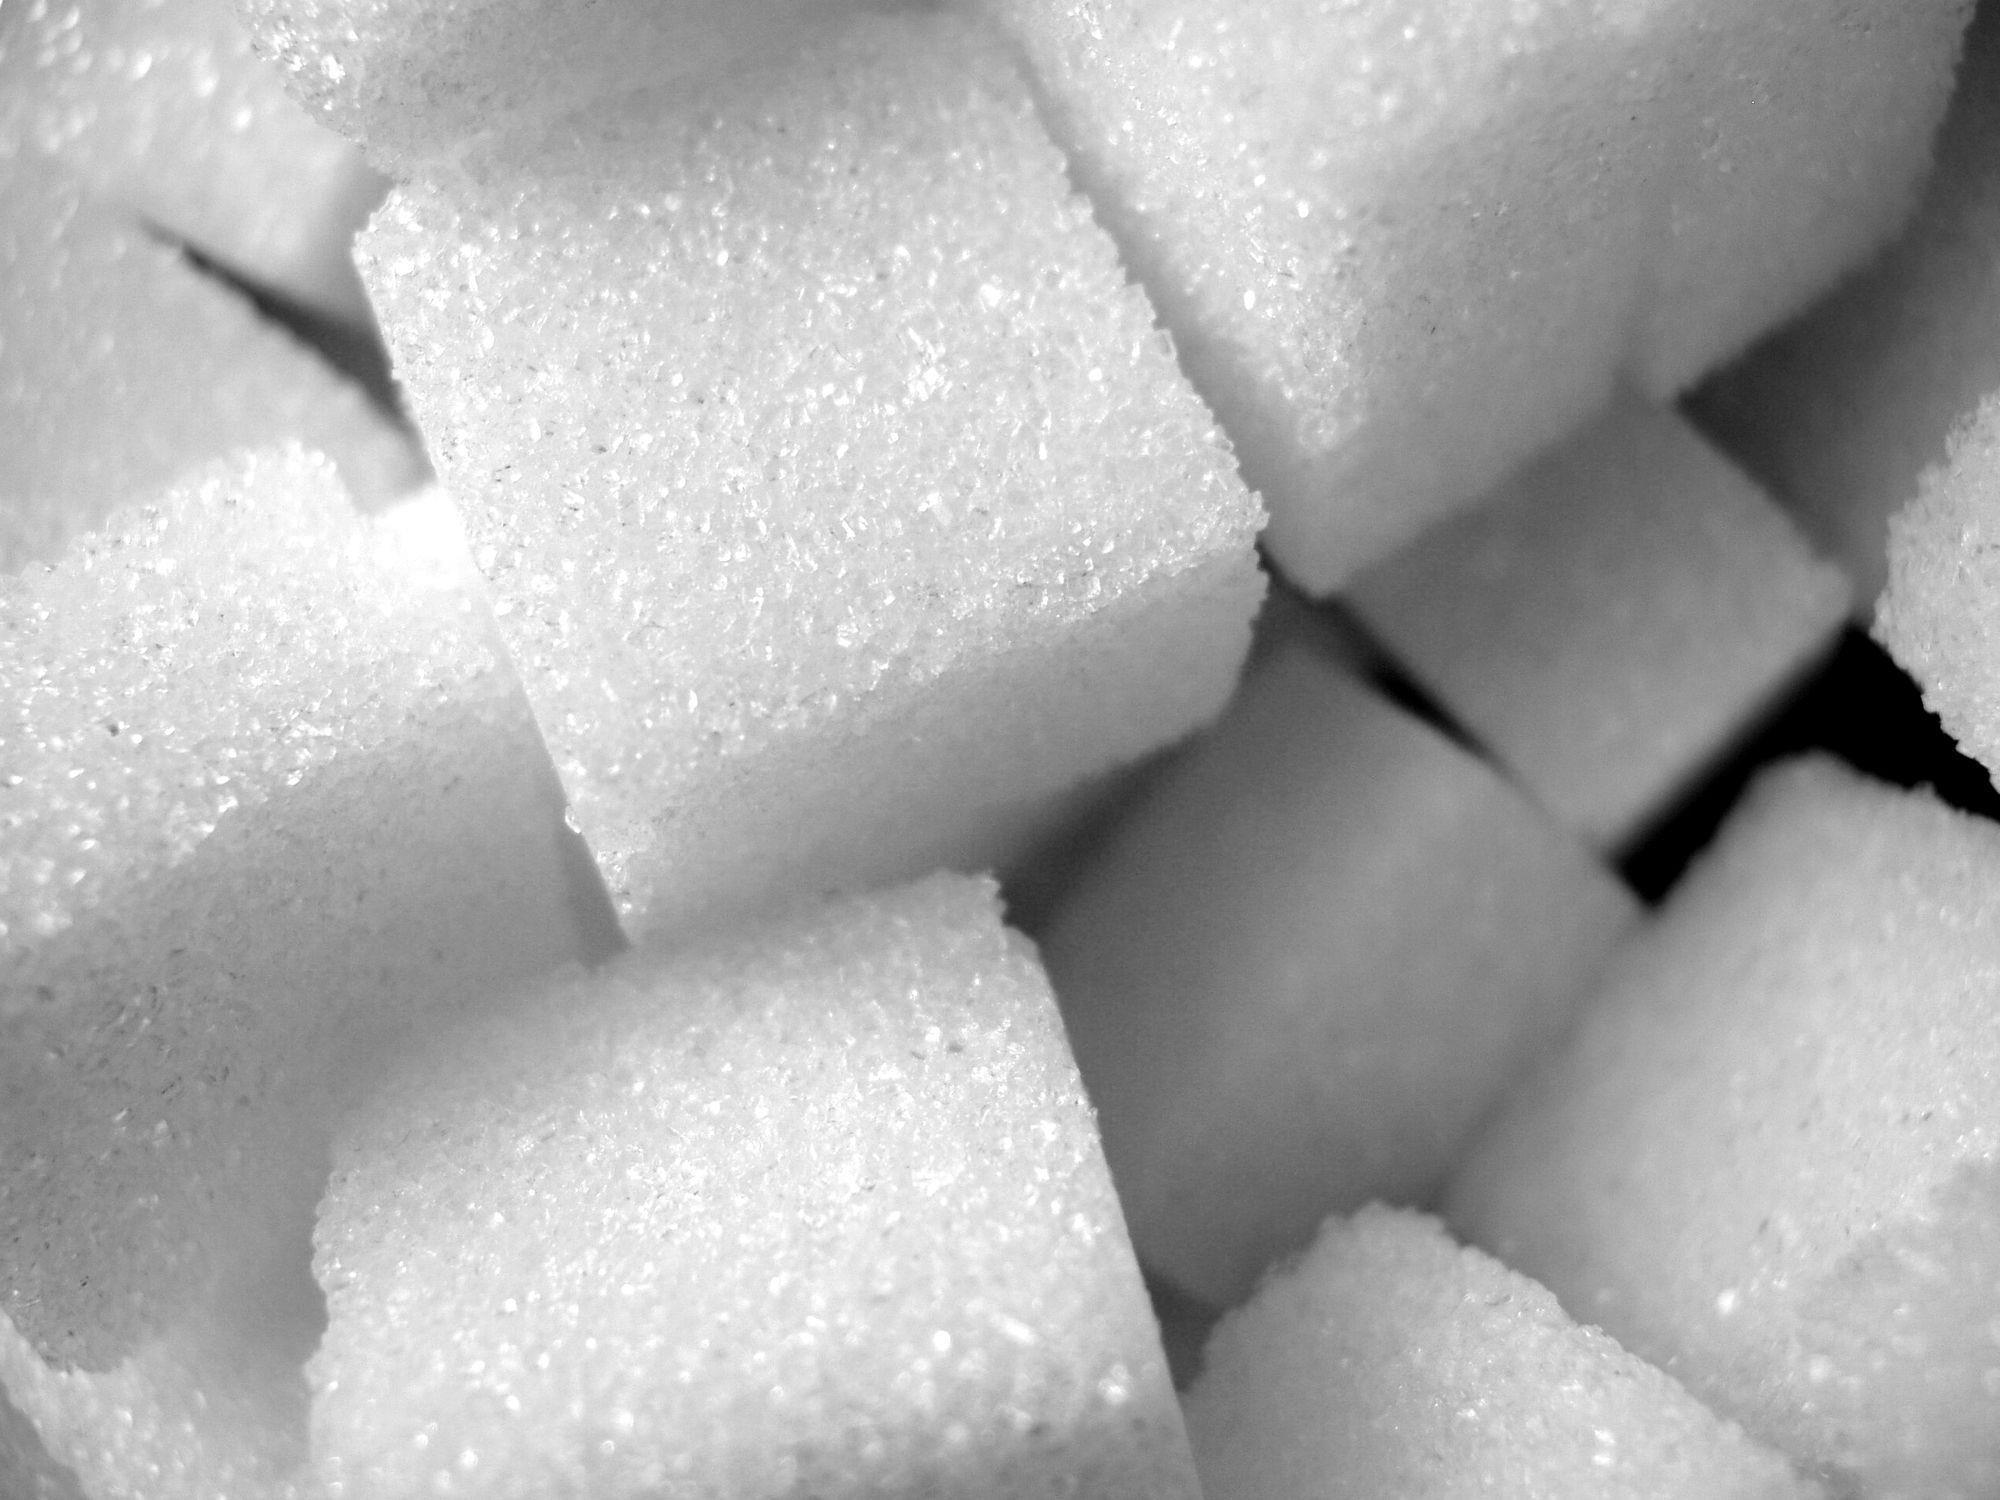 Zucker soll Selbstdisziplin ankurbeln.